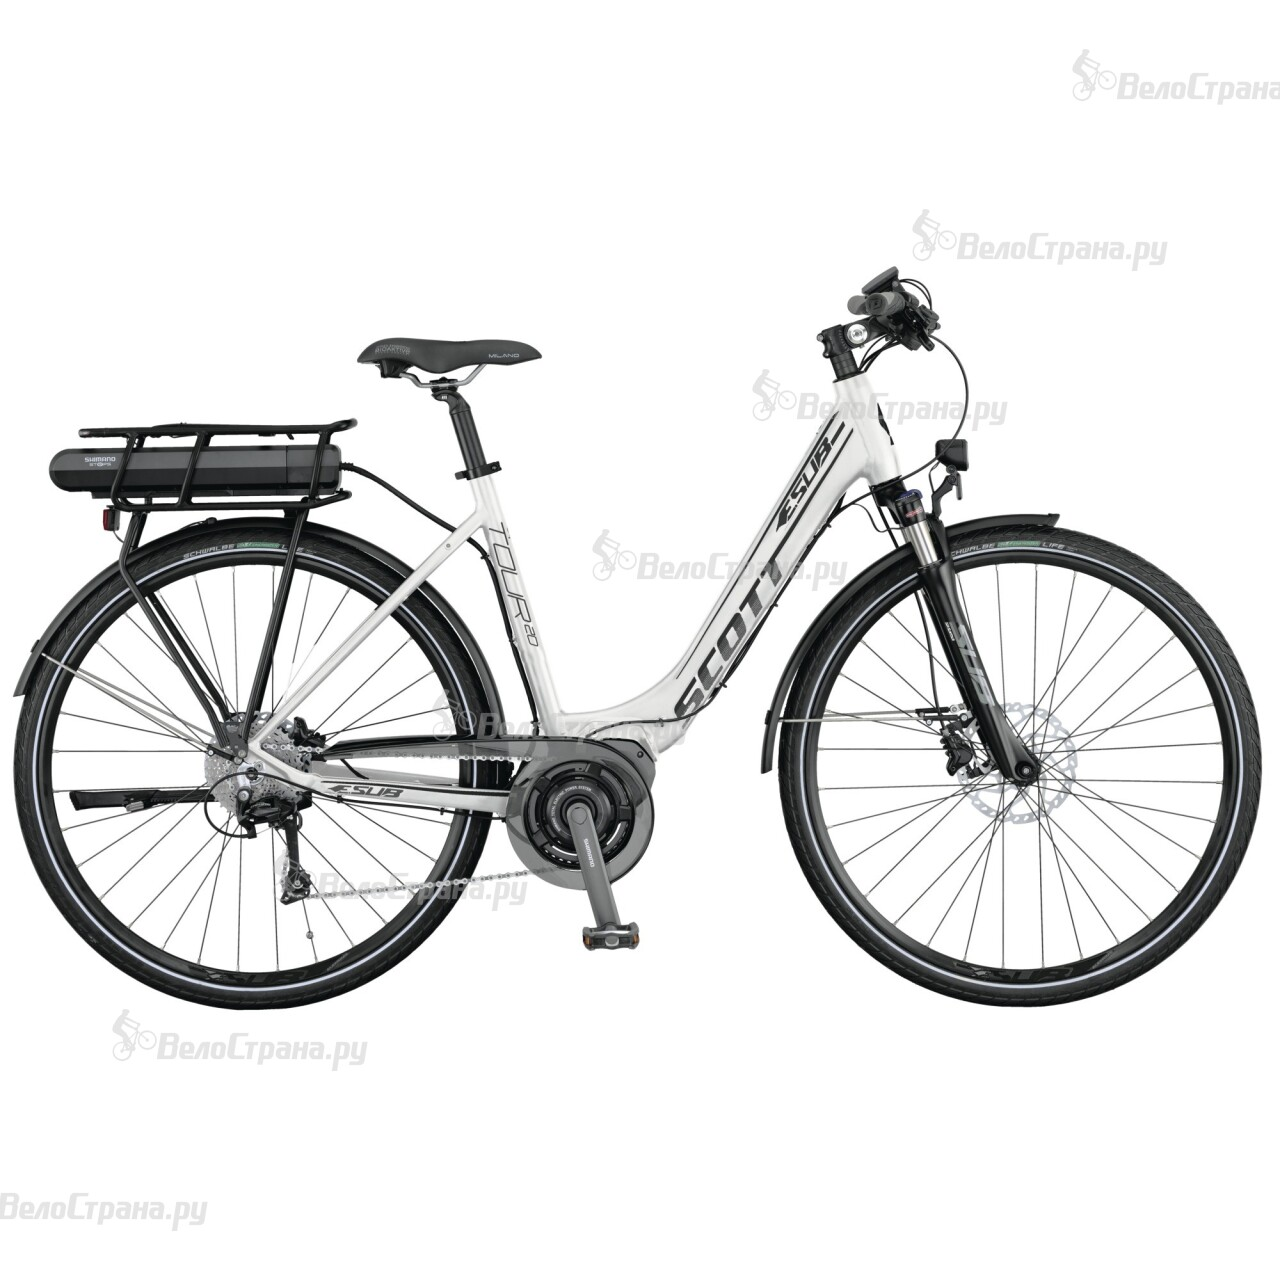 Велосипед Scott E.SUB Tour 20 Unisex (2015) scott addict sl compact 2015